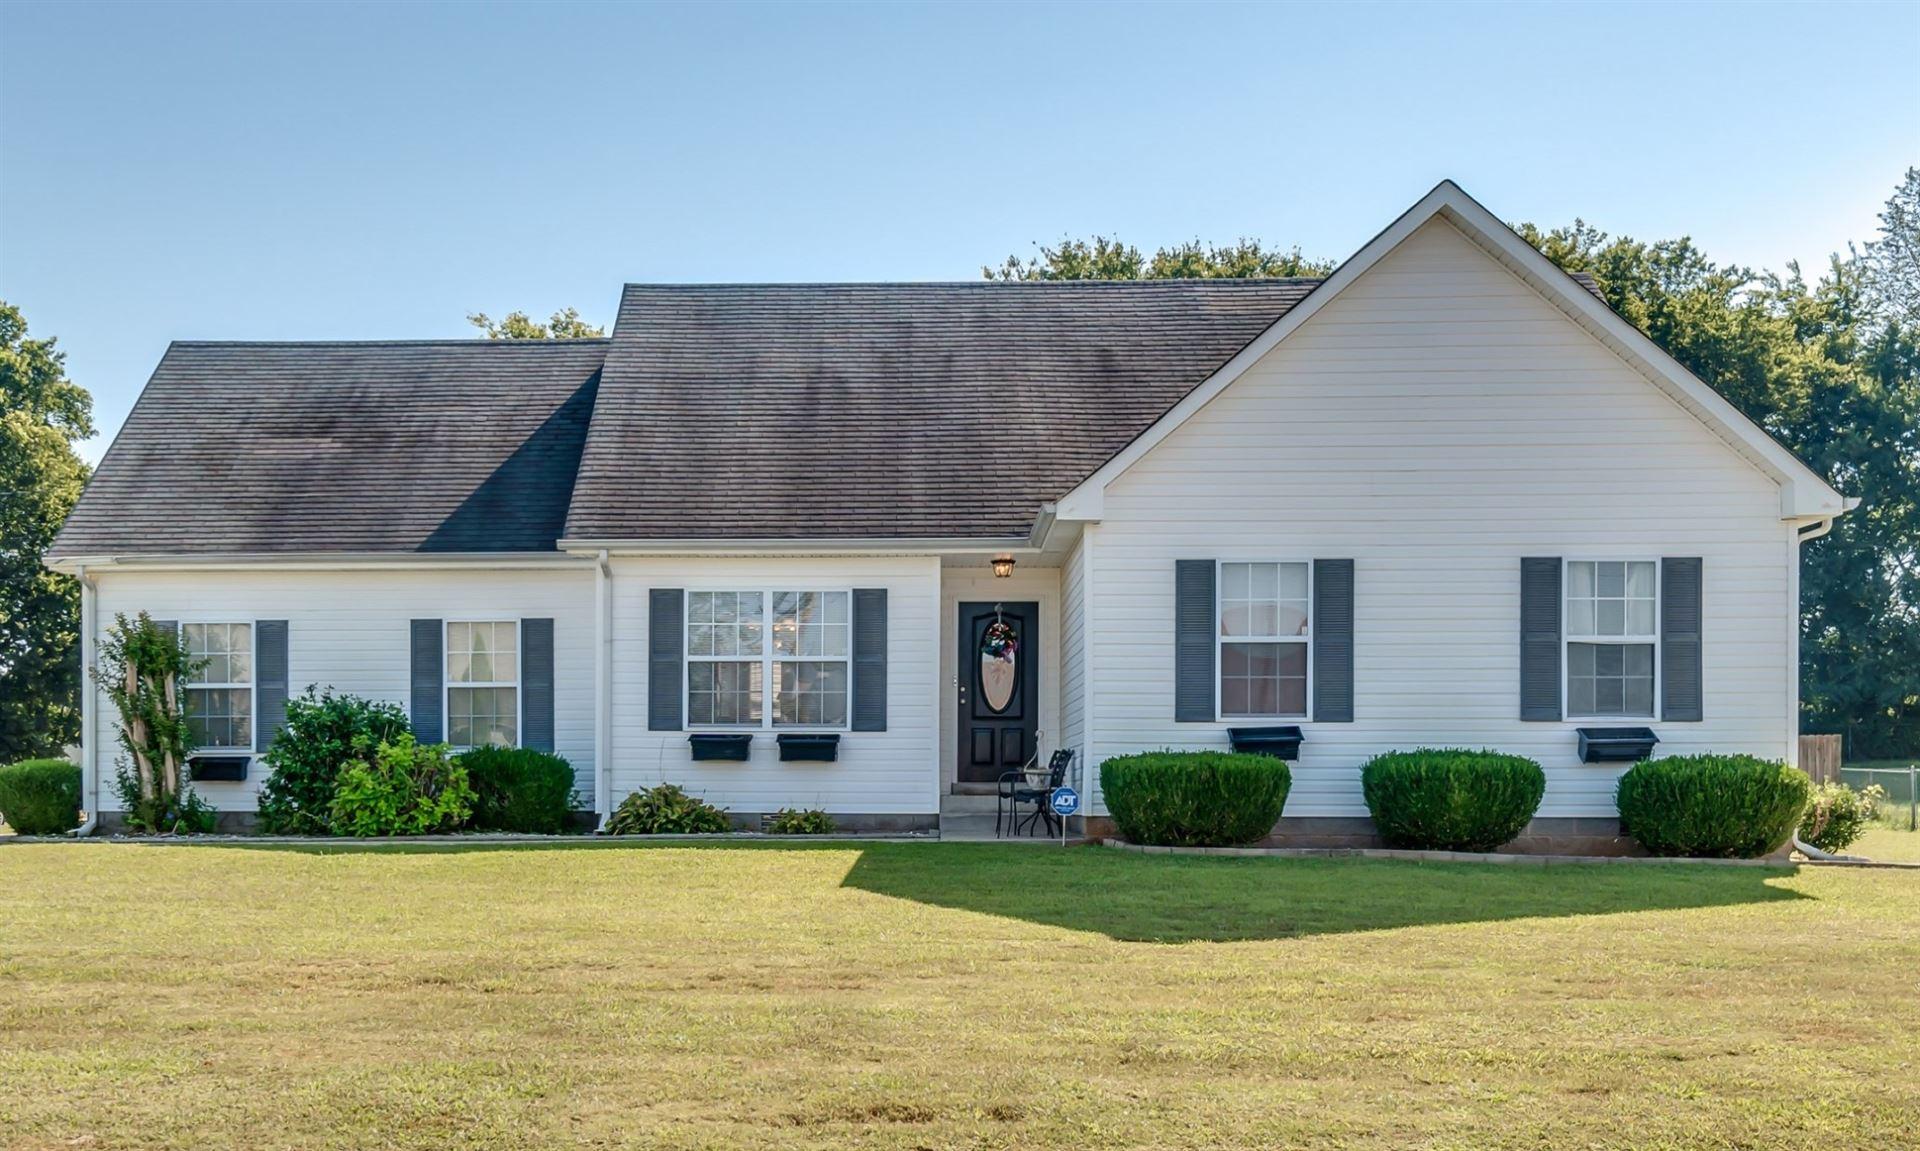 1287 Meredith Way, Clarksville, TN 37042 - MLS#: 2296597